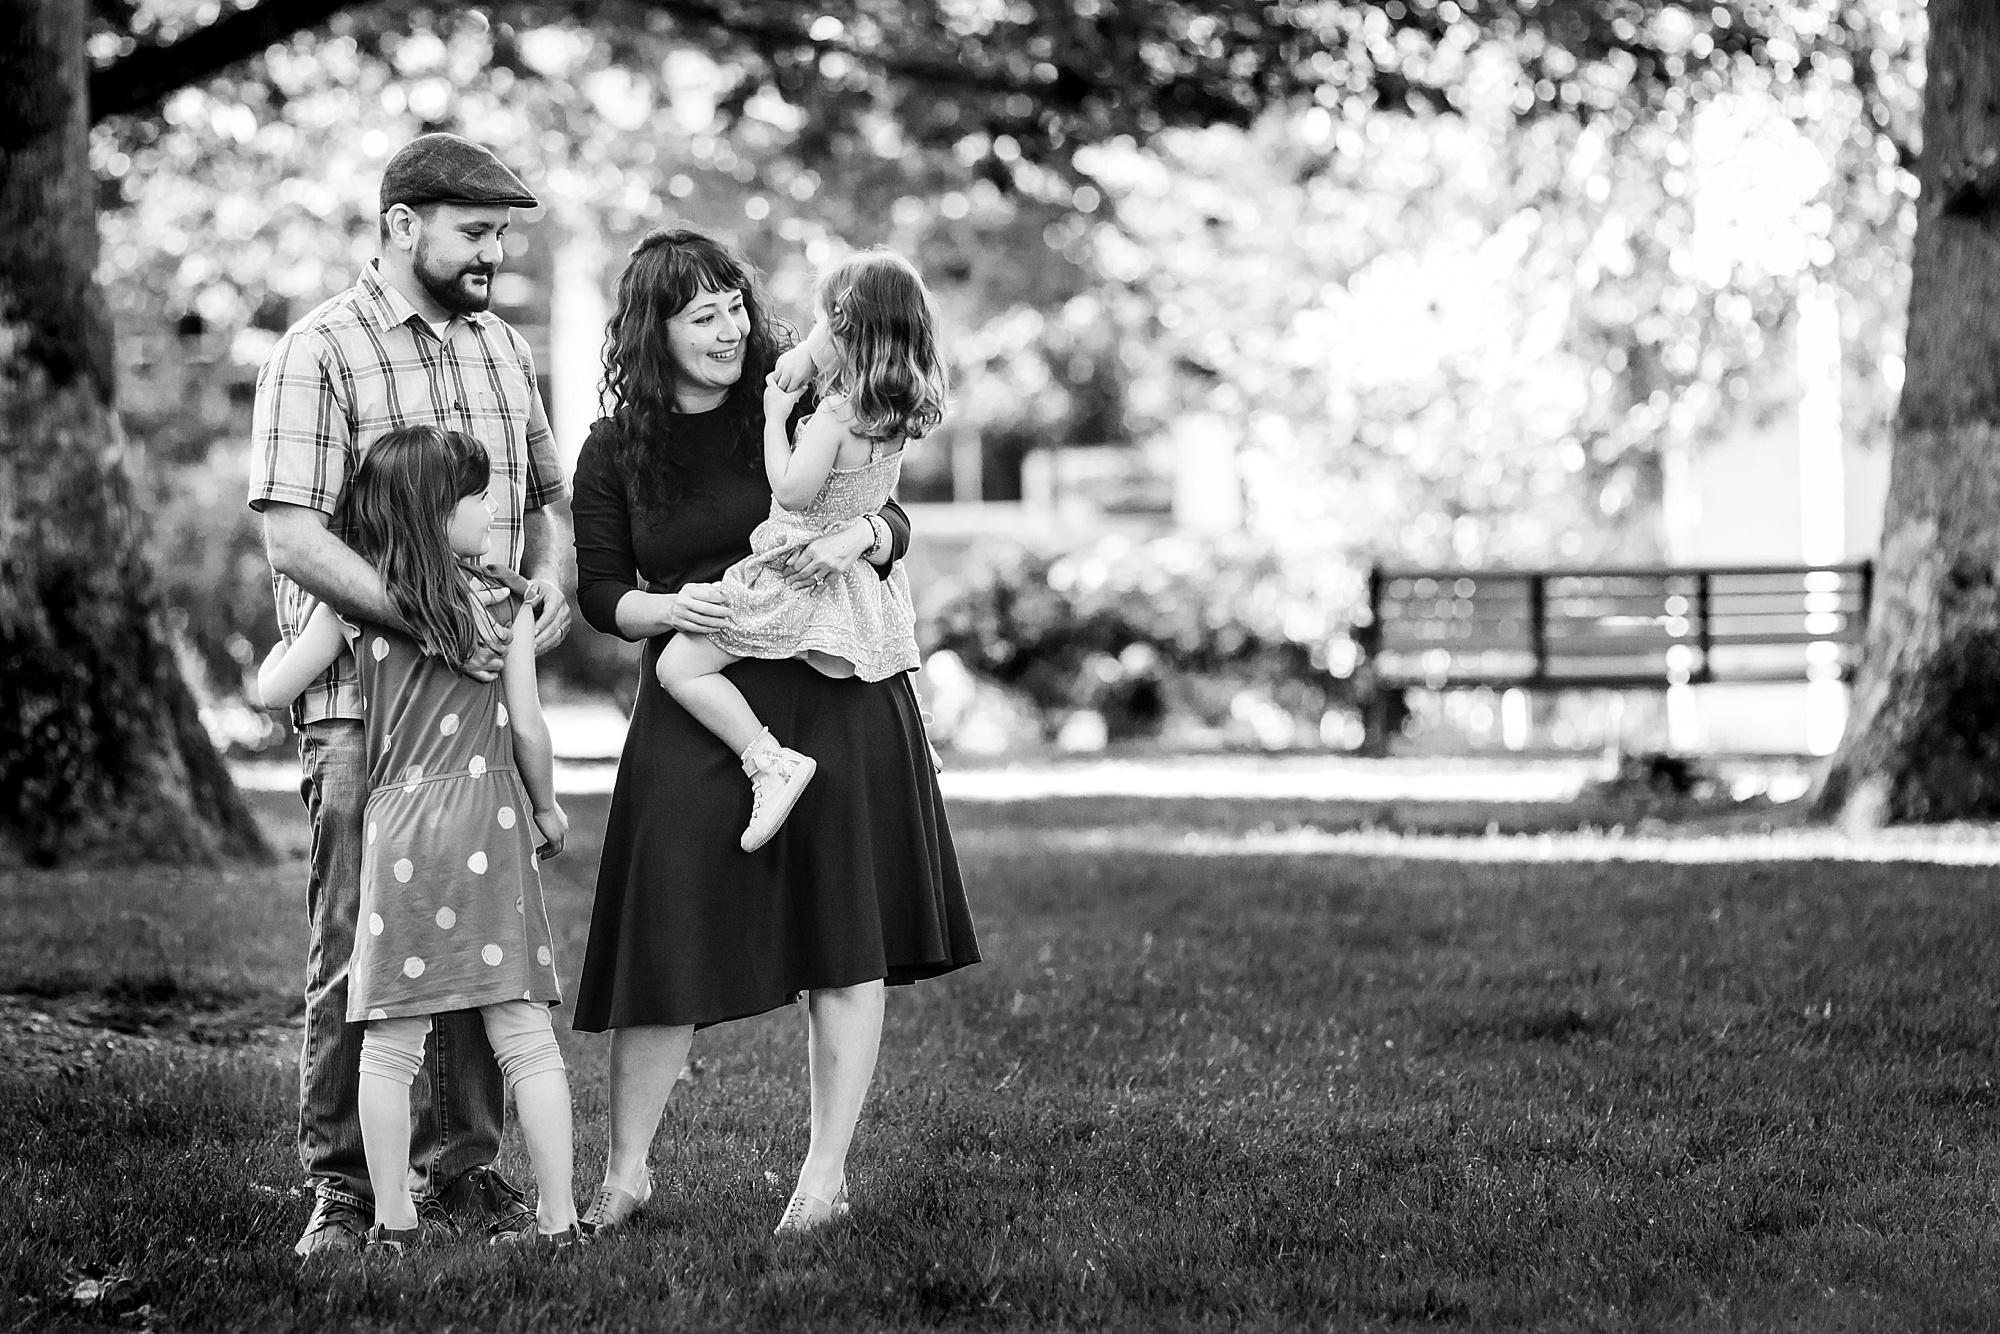 Portland_Metro_Modern_Family_Photos_Hunnicutt_Photography_0022